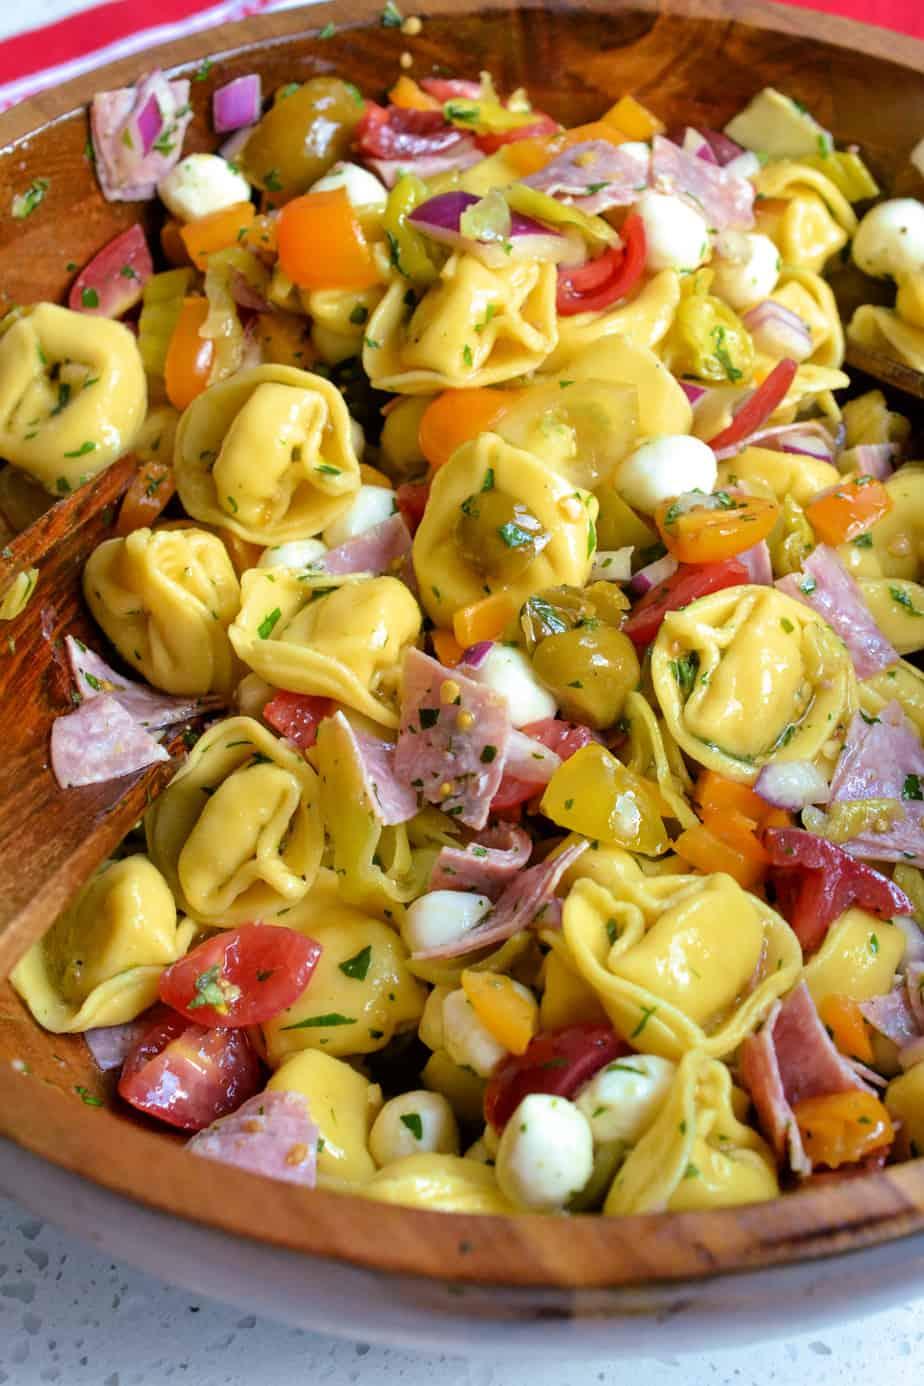 Bowl full of Italian Tortellini Pasta Salad